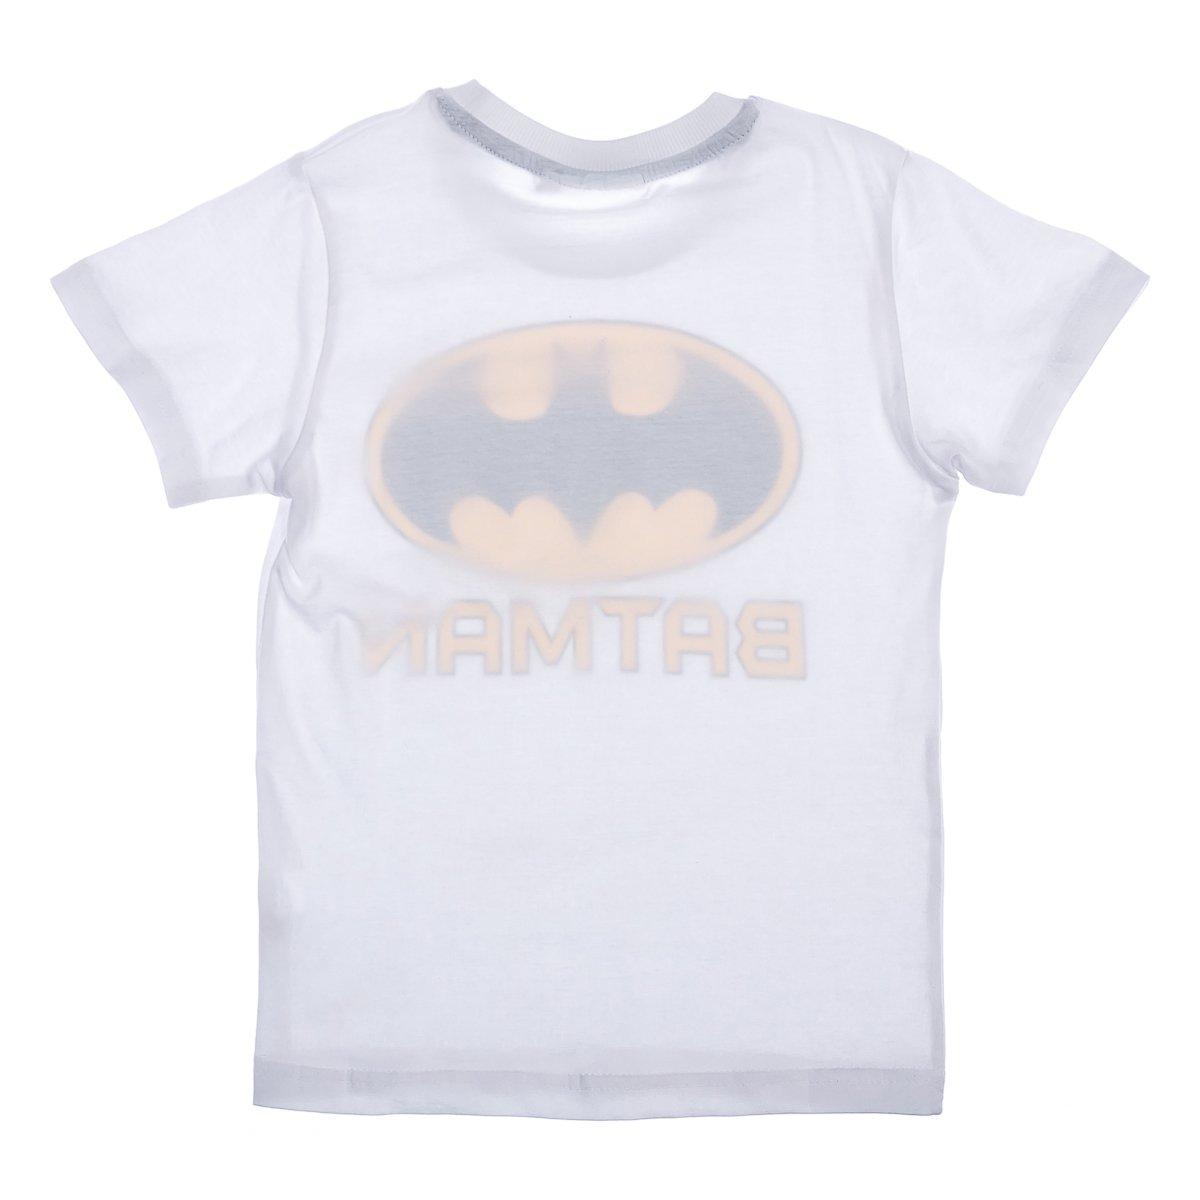 Купить Футболки, майки, топы, туники, Футболка E Plus M Batman White, р. 128 BAT5202184 ТМ: E Plus M, белый